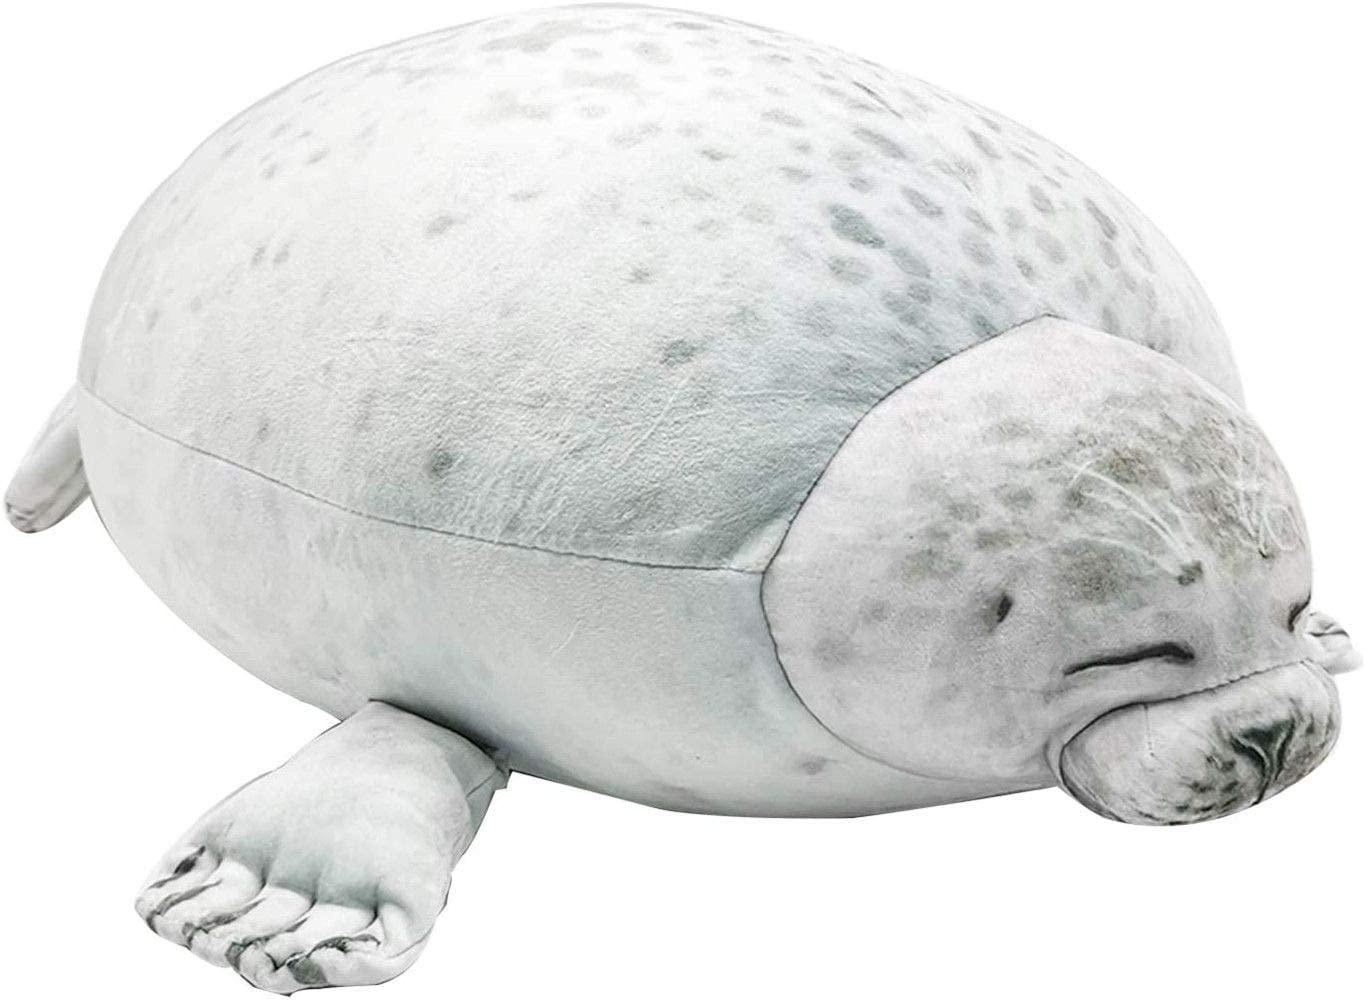 Gurnall Throw Pillow Cute Chubby Seal Pillow Soft Round Blob Seal Pillow Hug Plush Pillow Stuffed Cotton Animal Plush Toy